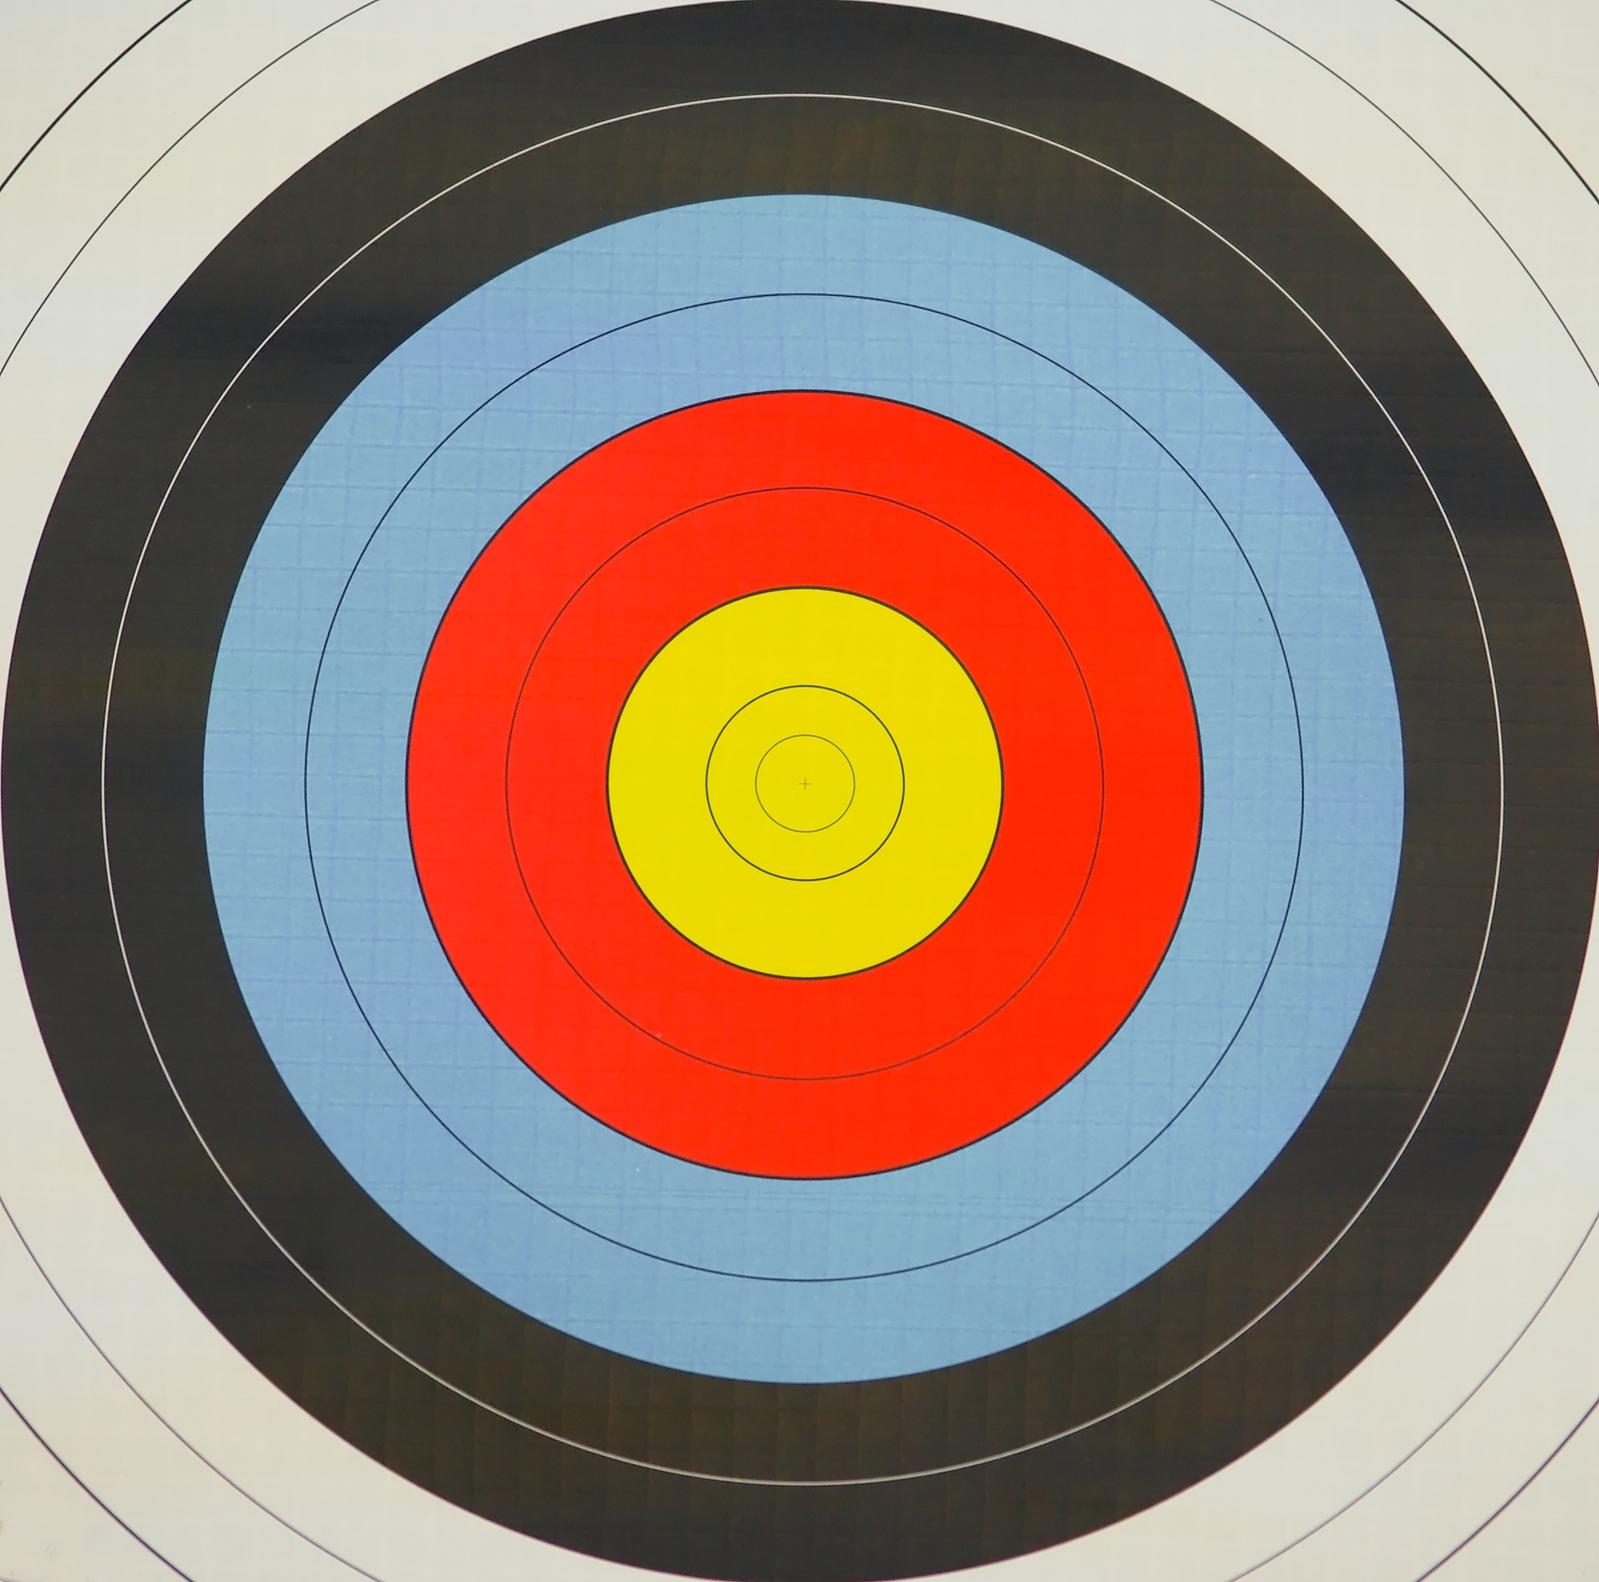 target-1166687-1599x1581.jpg